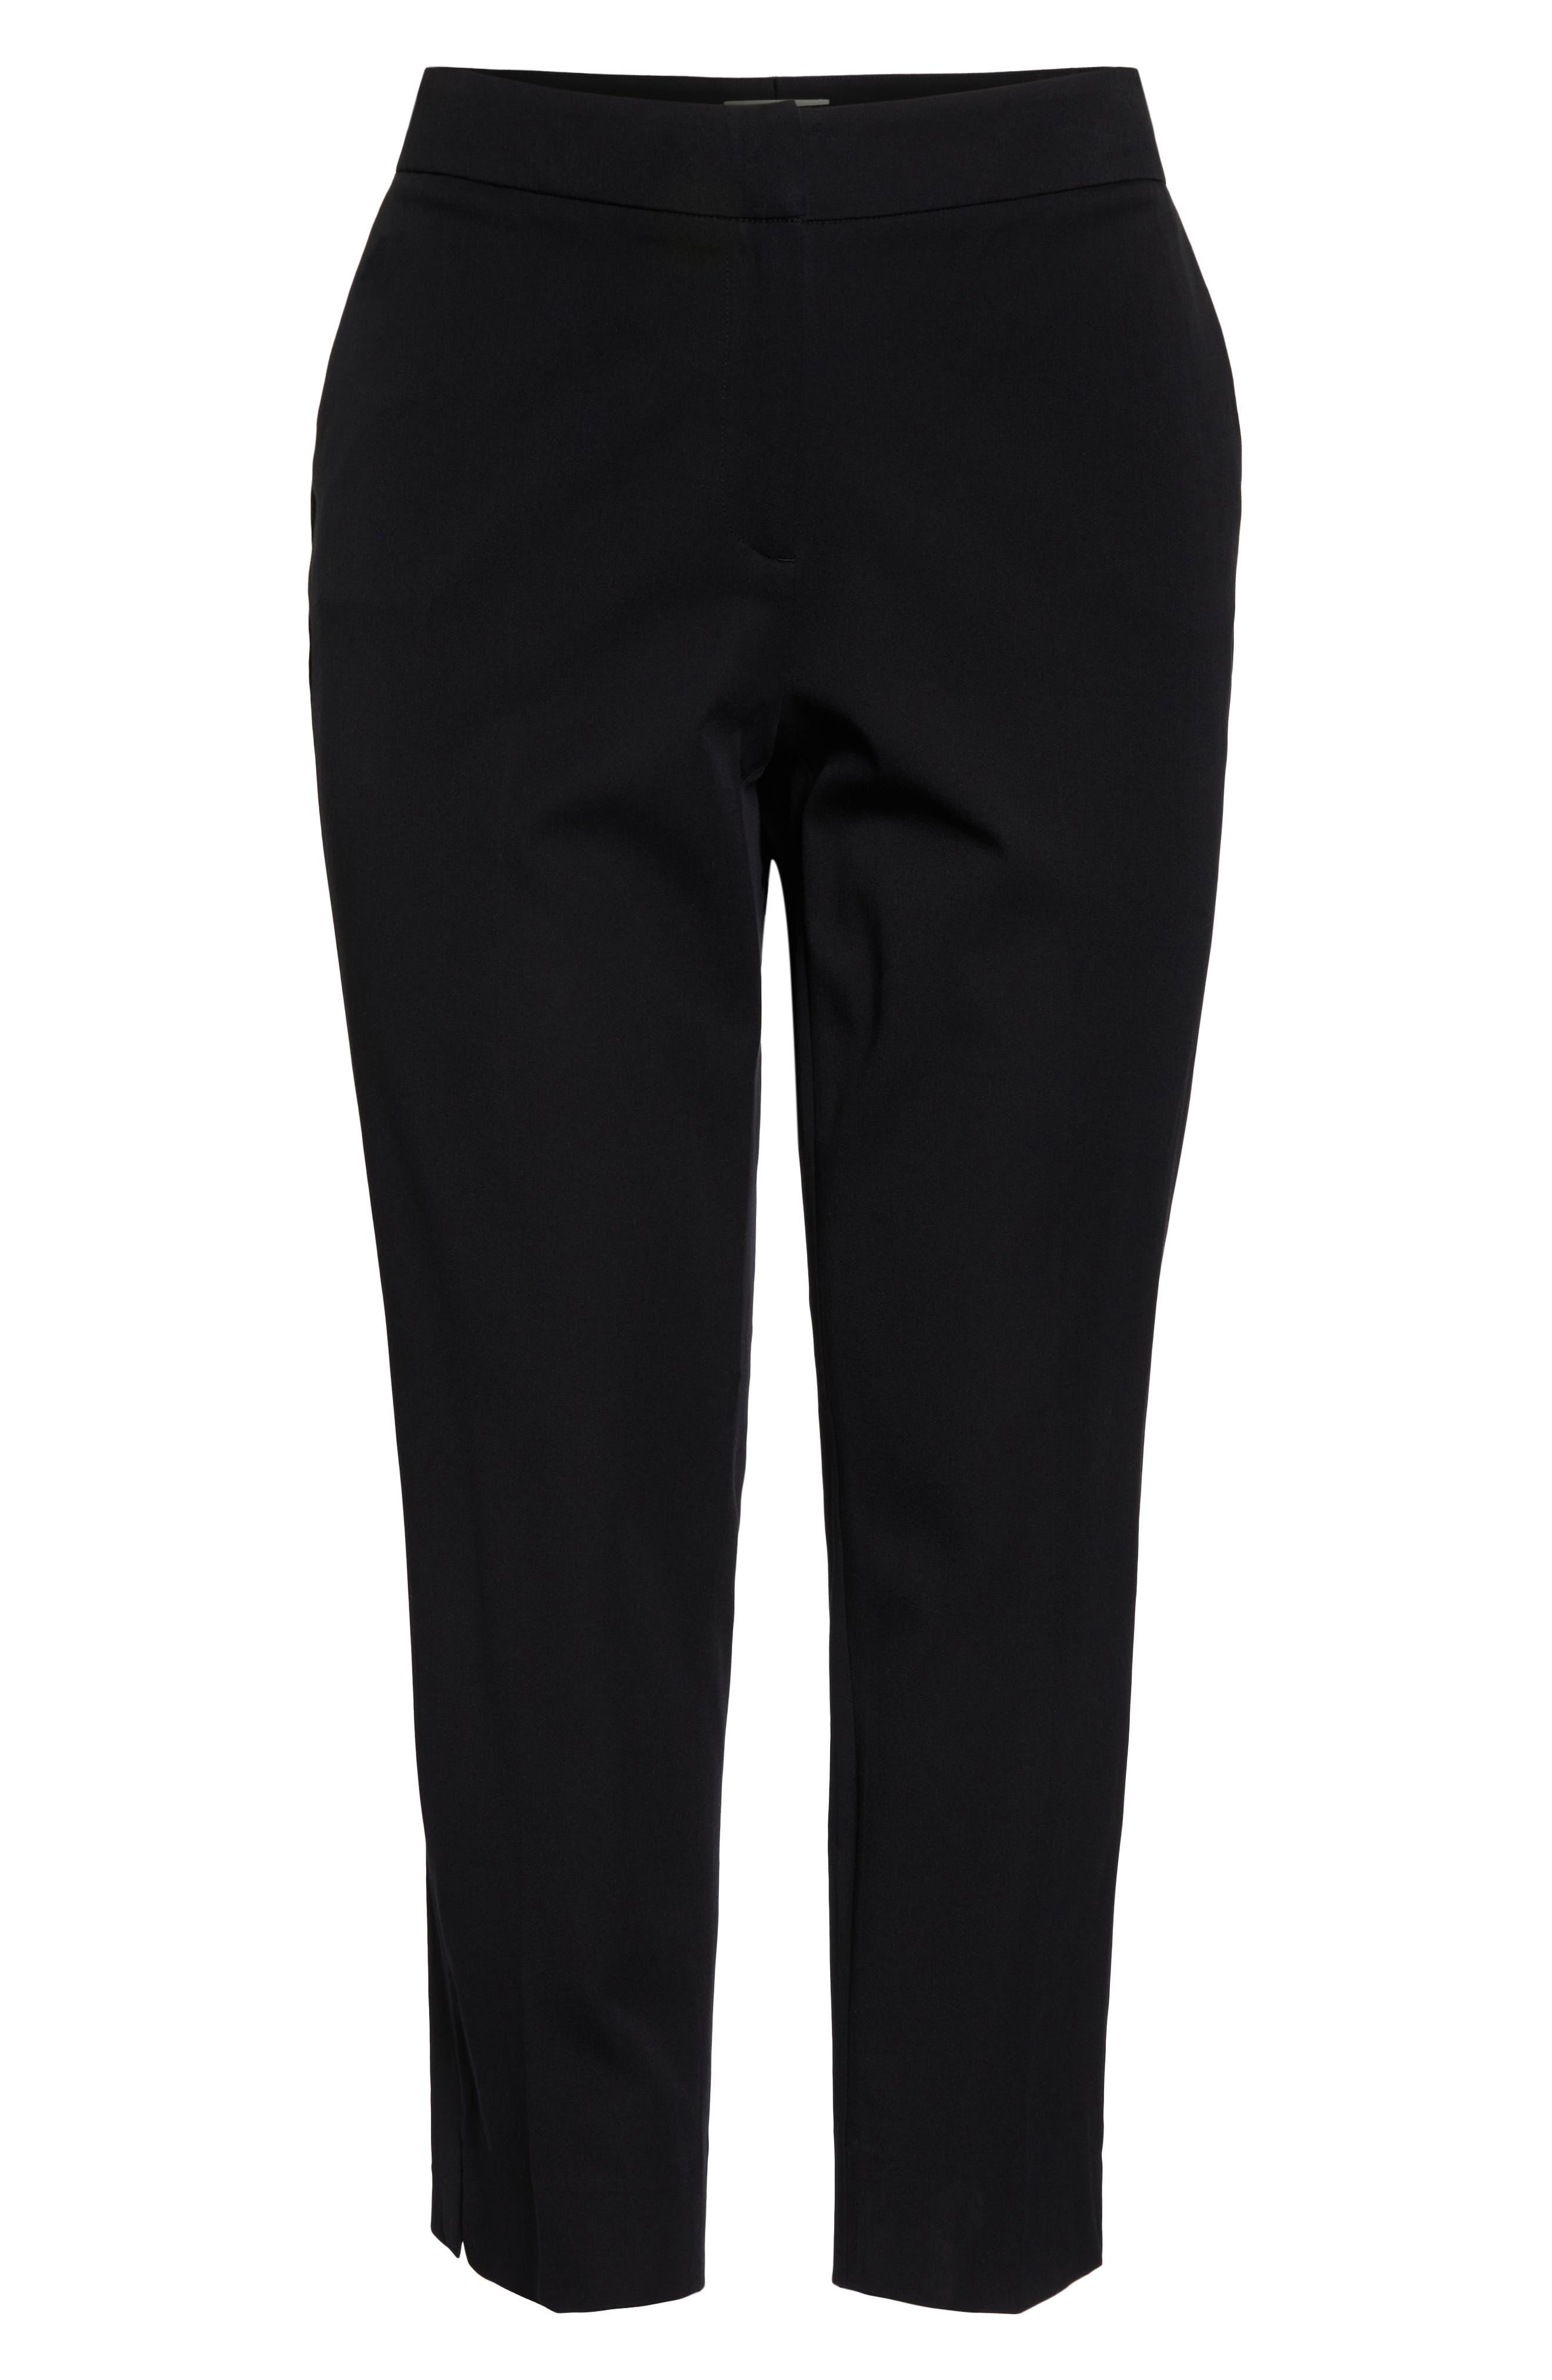 SEJOUR, Straight Leg Ankle Pants, Alternate thumbnail 8, color, BLACK